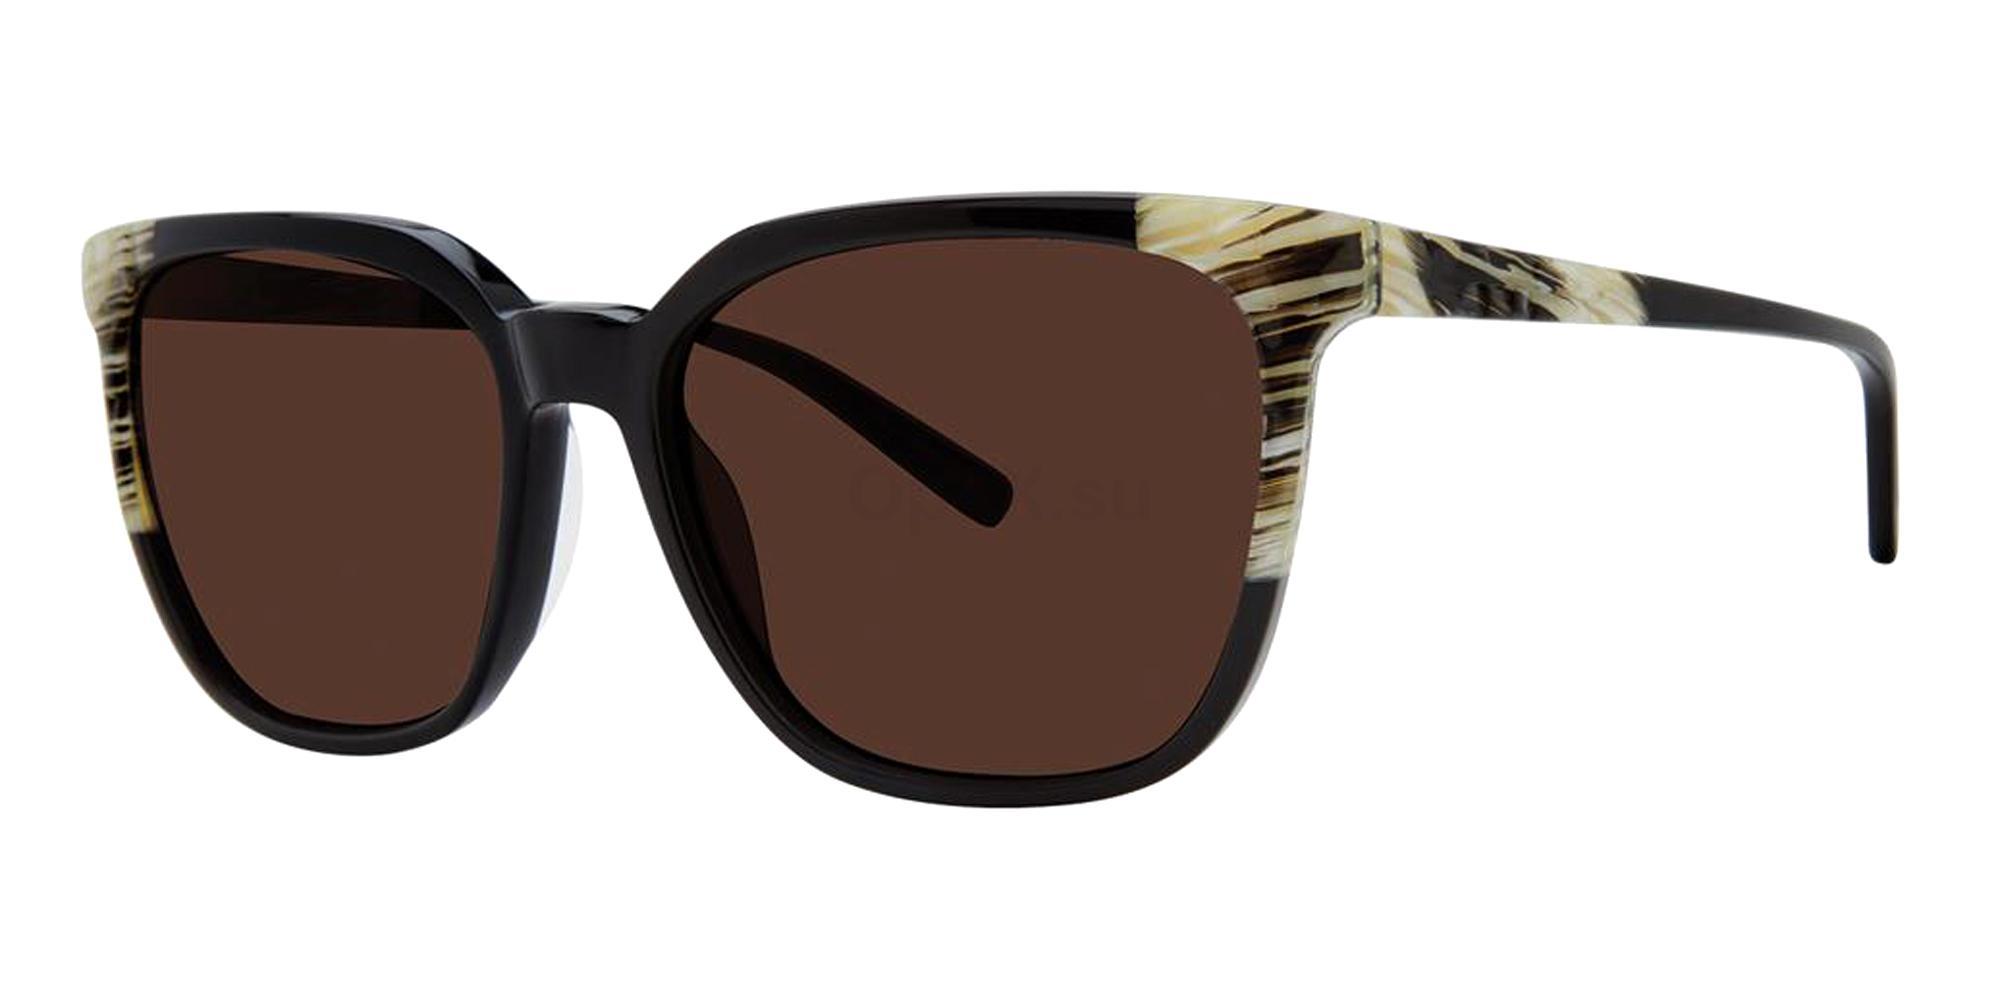 Black Horn V477 Sunglasses, Vera Wang